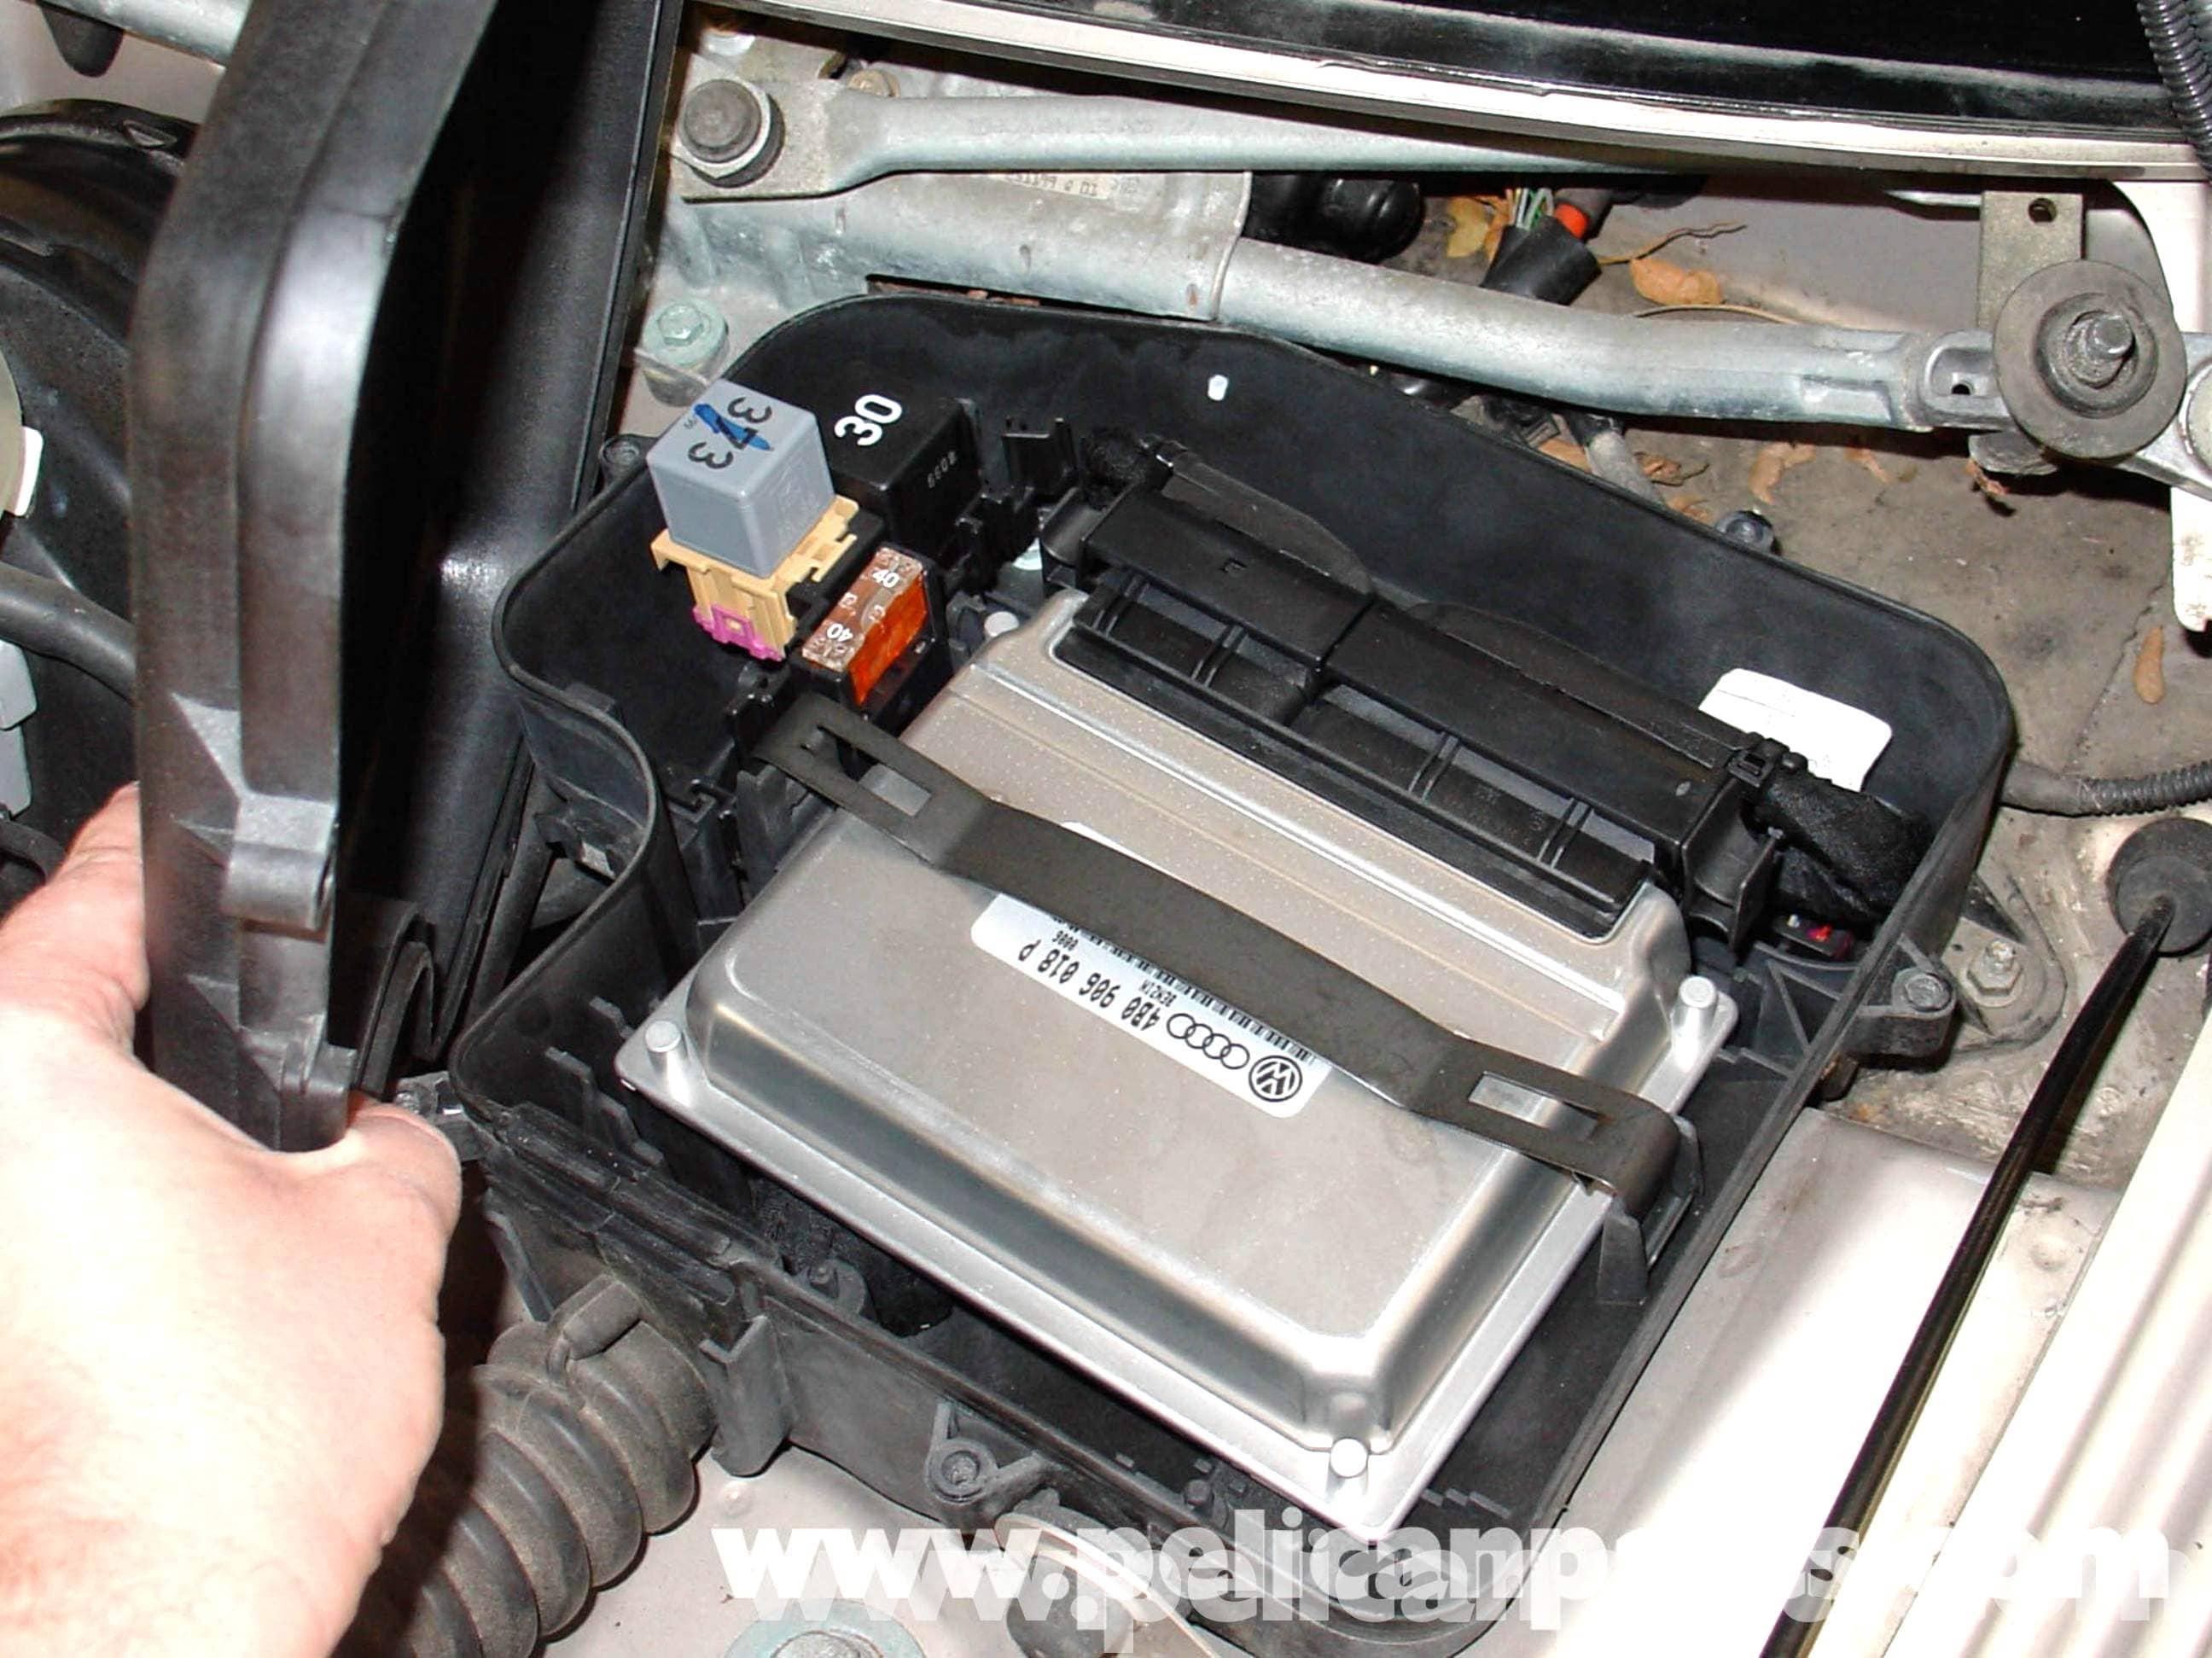 2002 jetta tdi fuse diagram caravan electric brakes wiring 2004 volkswagen panel www toyskids co audi a4 1 8t ecu replacement golf